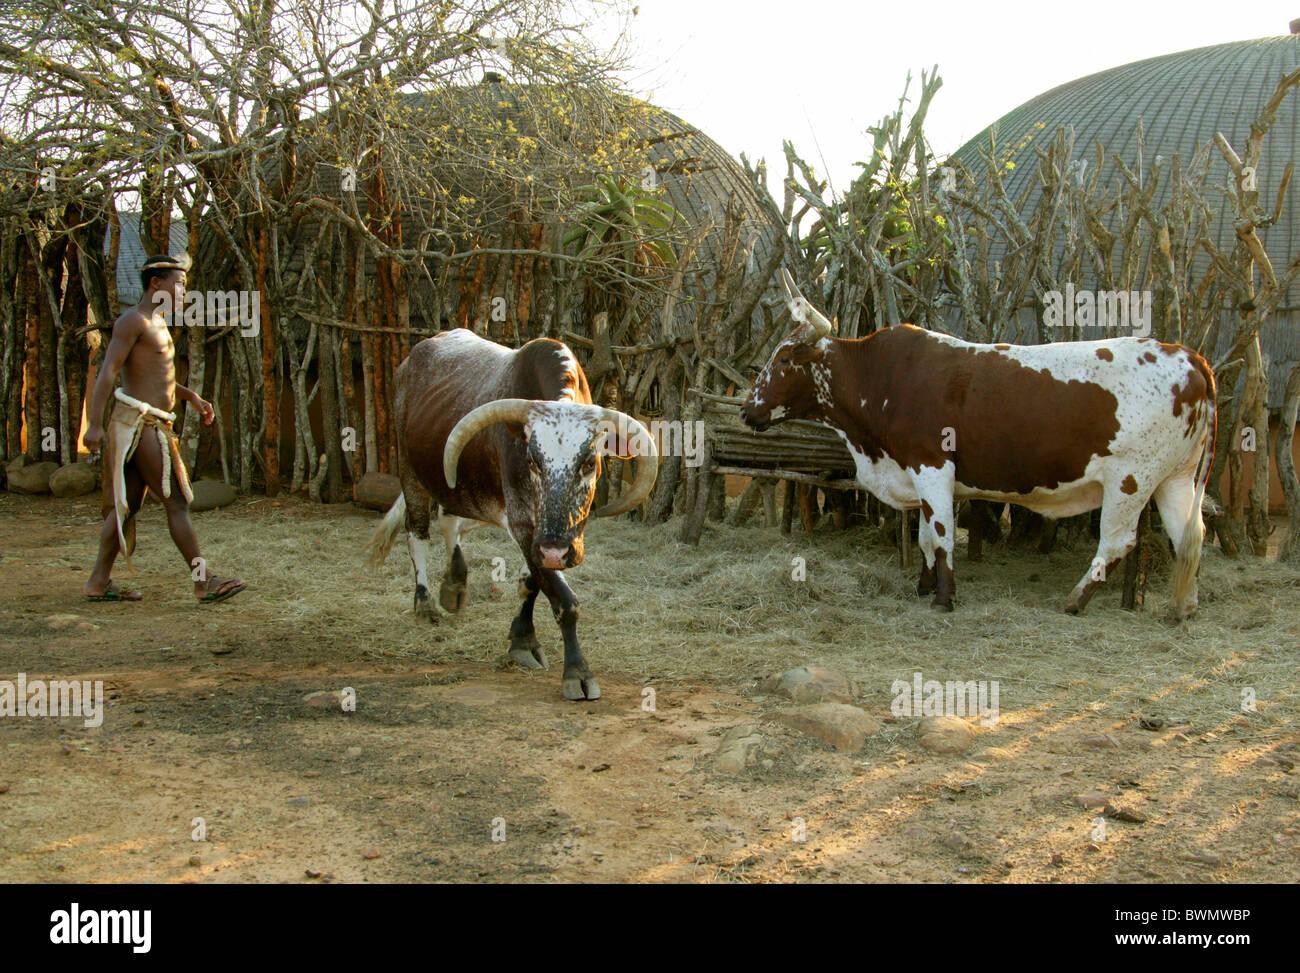 Zulu traditional dress in zulu kraal kwazulu natal - Zulu Man And Nguni Cattle Shakaland Zulu Village Nkwalini Valley Kwazulu Natal